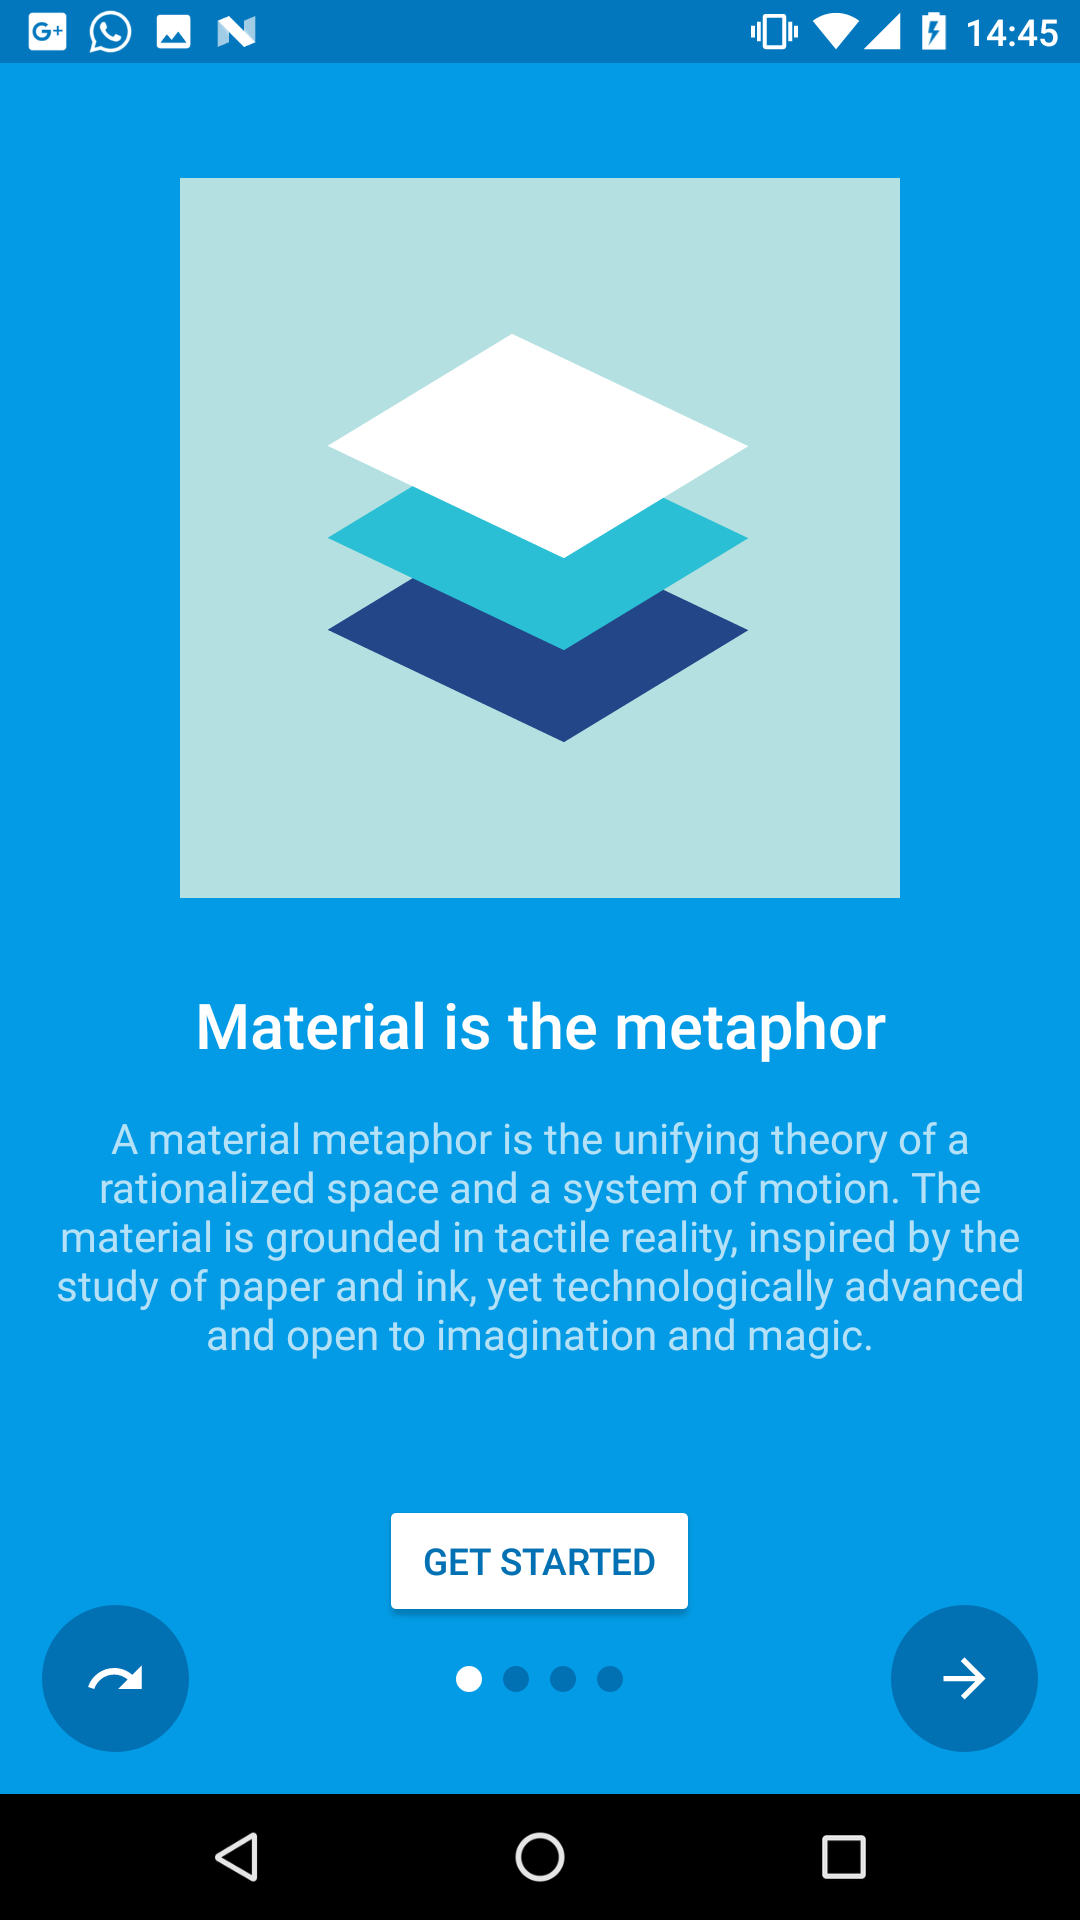 GitHub - heinrichreimer/material-intro: A simple material design app